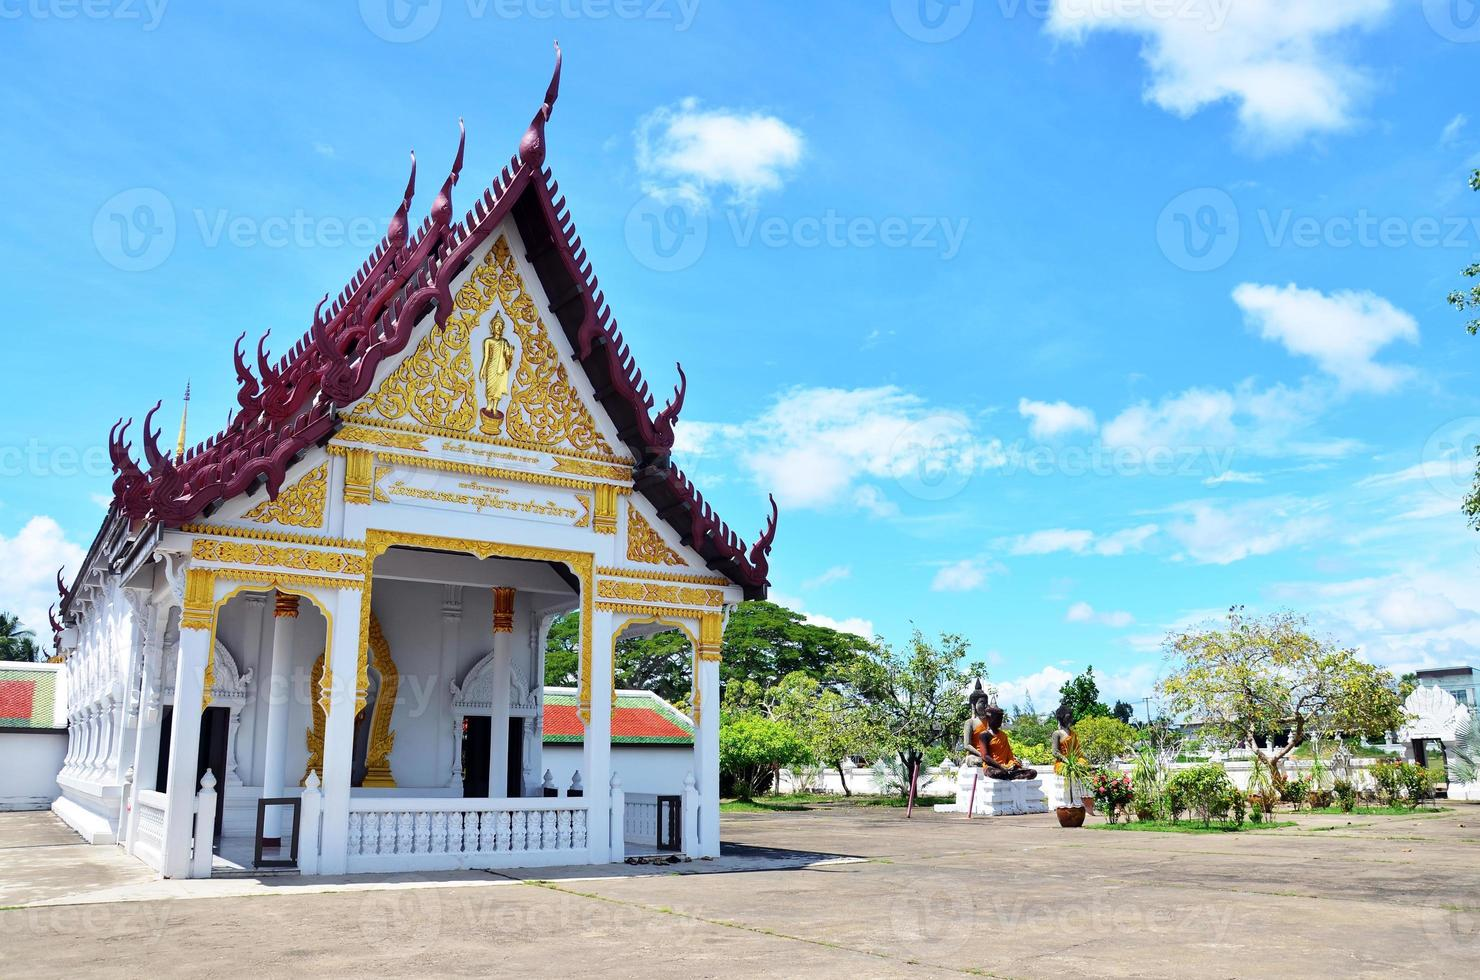 Wat Phra Borommathat Chaiya Temple in Chaiya Surat Thani foto